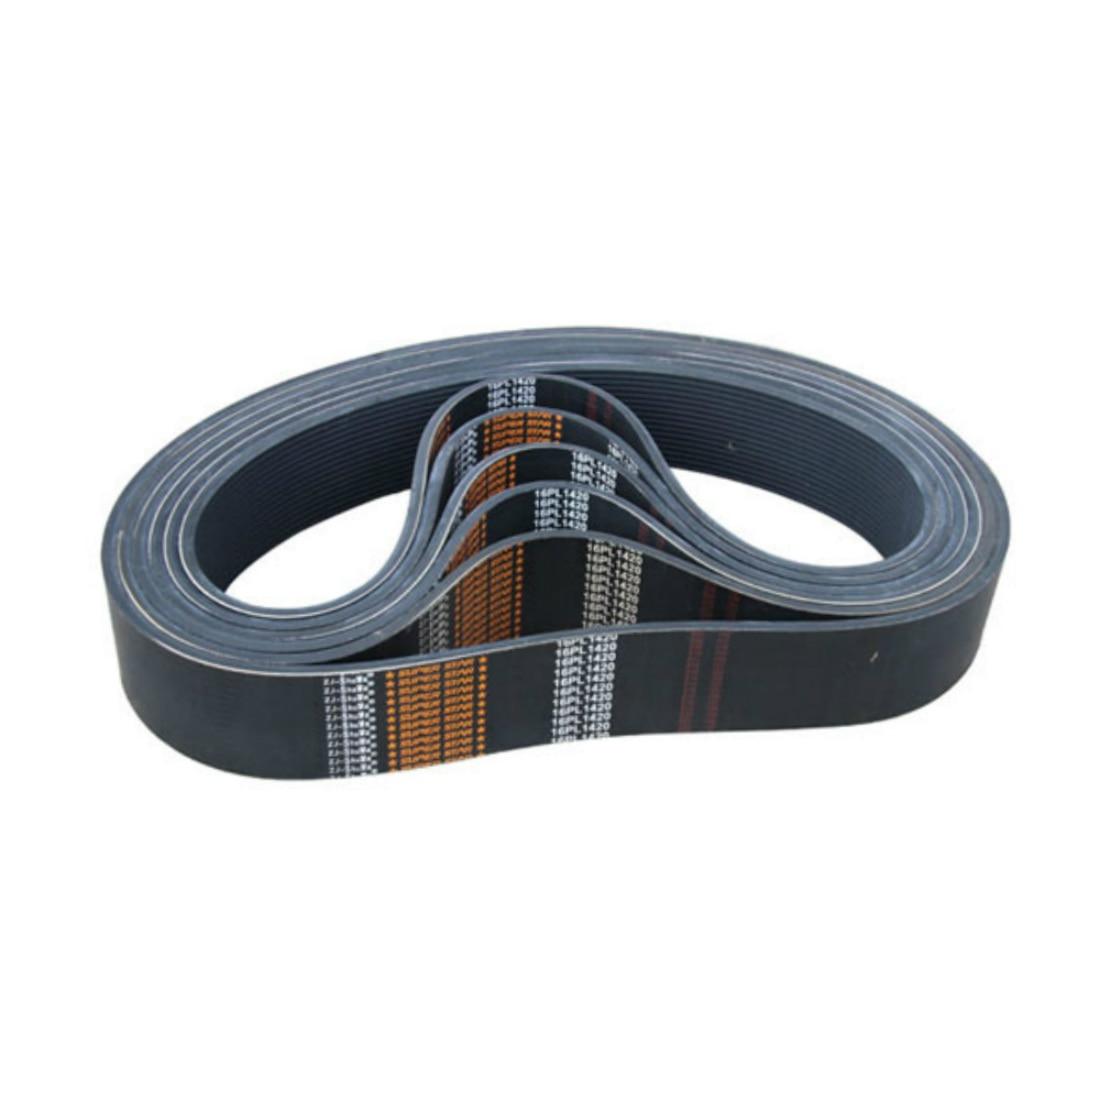 For Ingersoll Rand Screw Air Compressor Belt 89265060